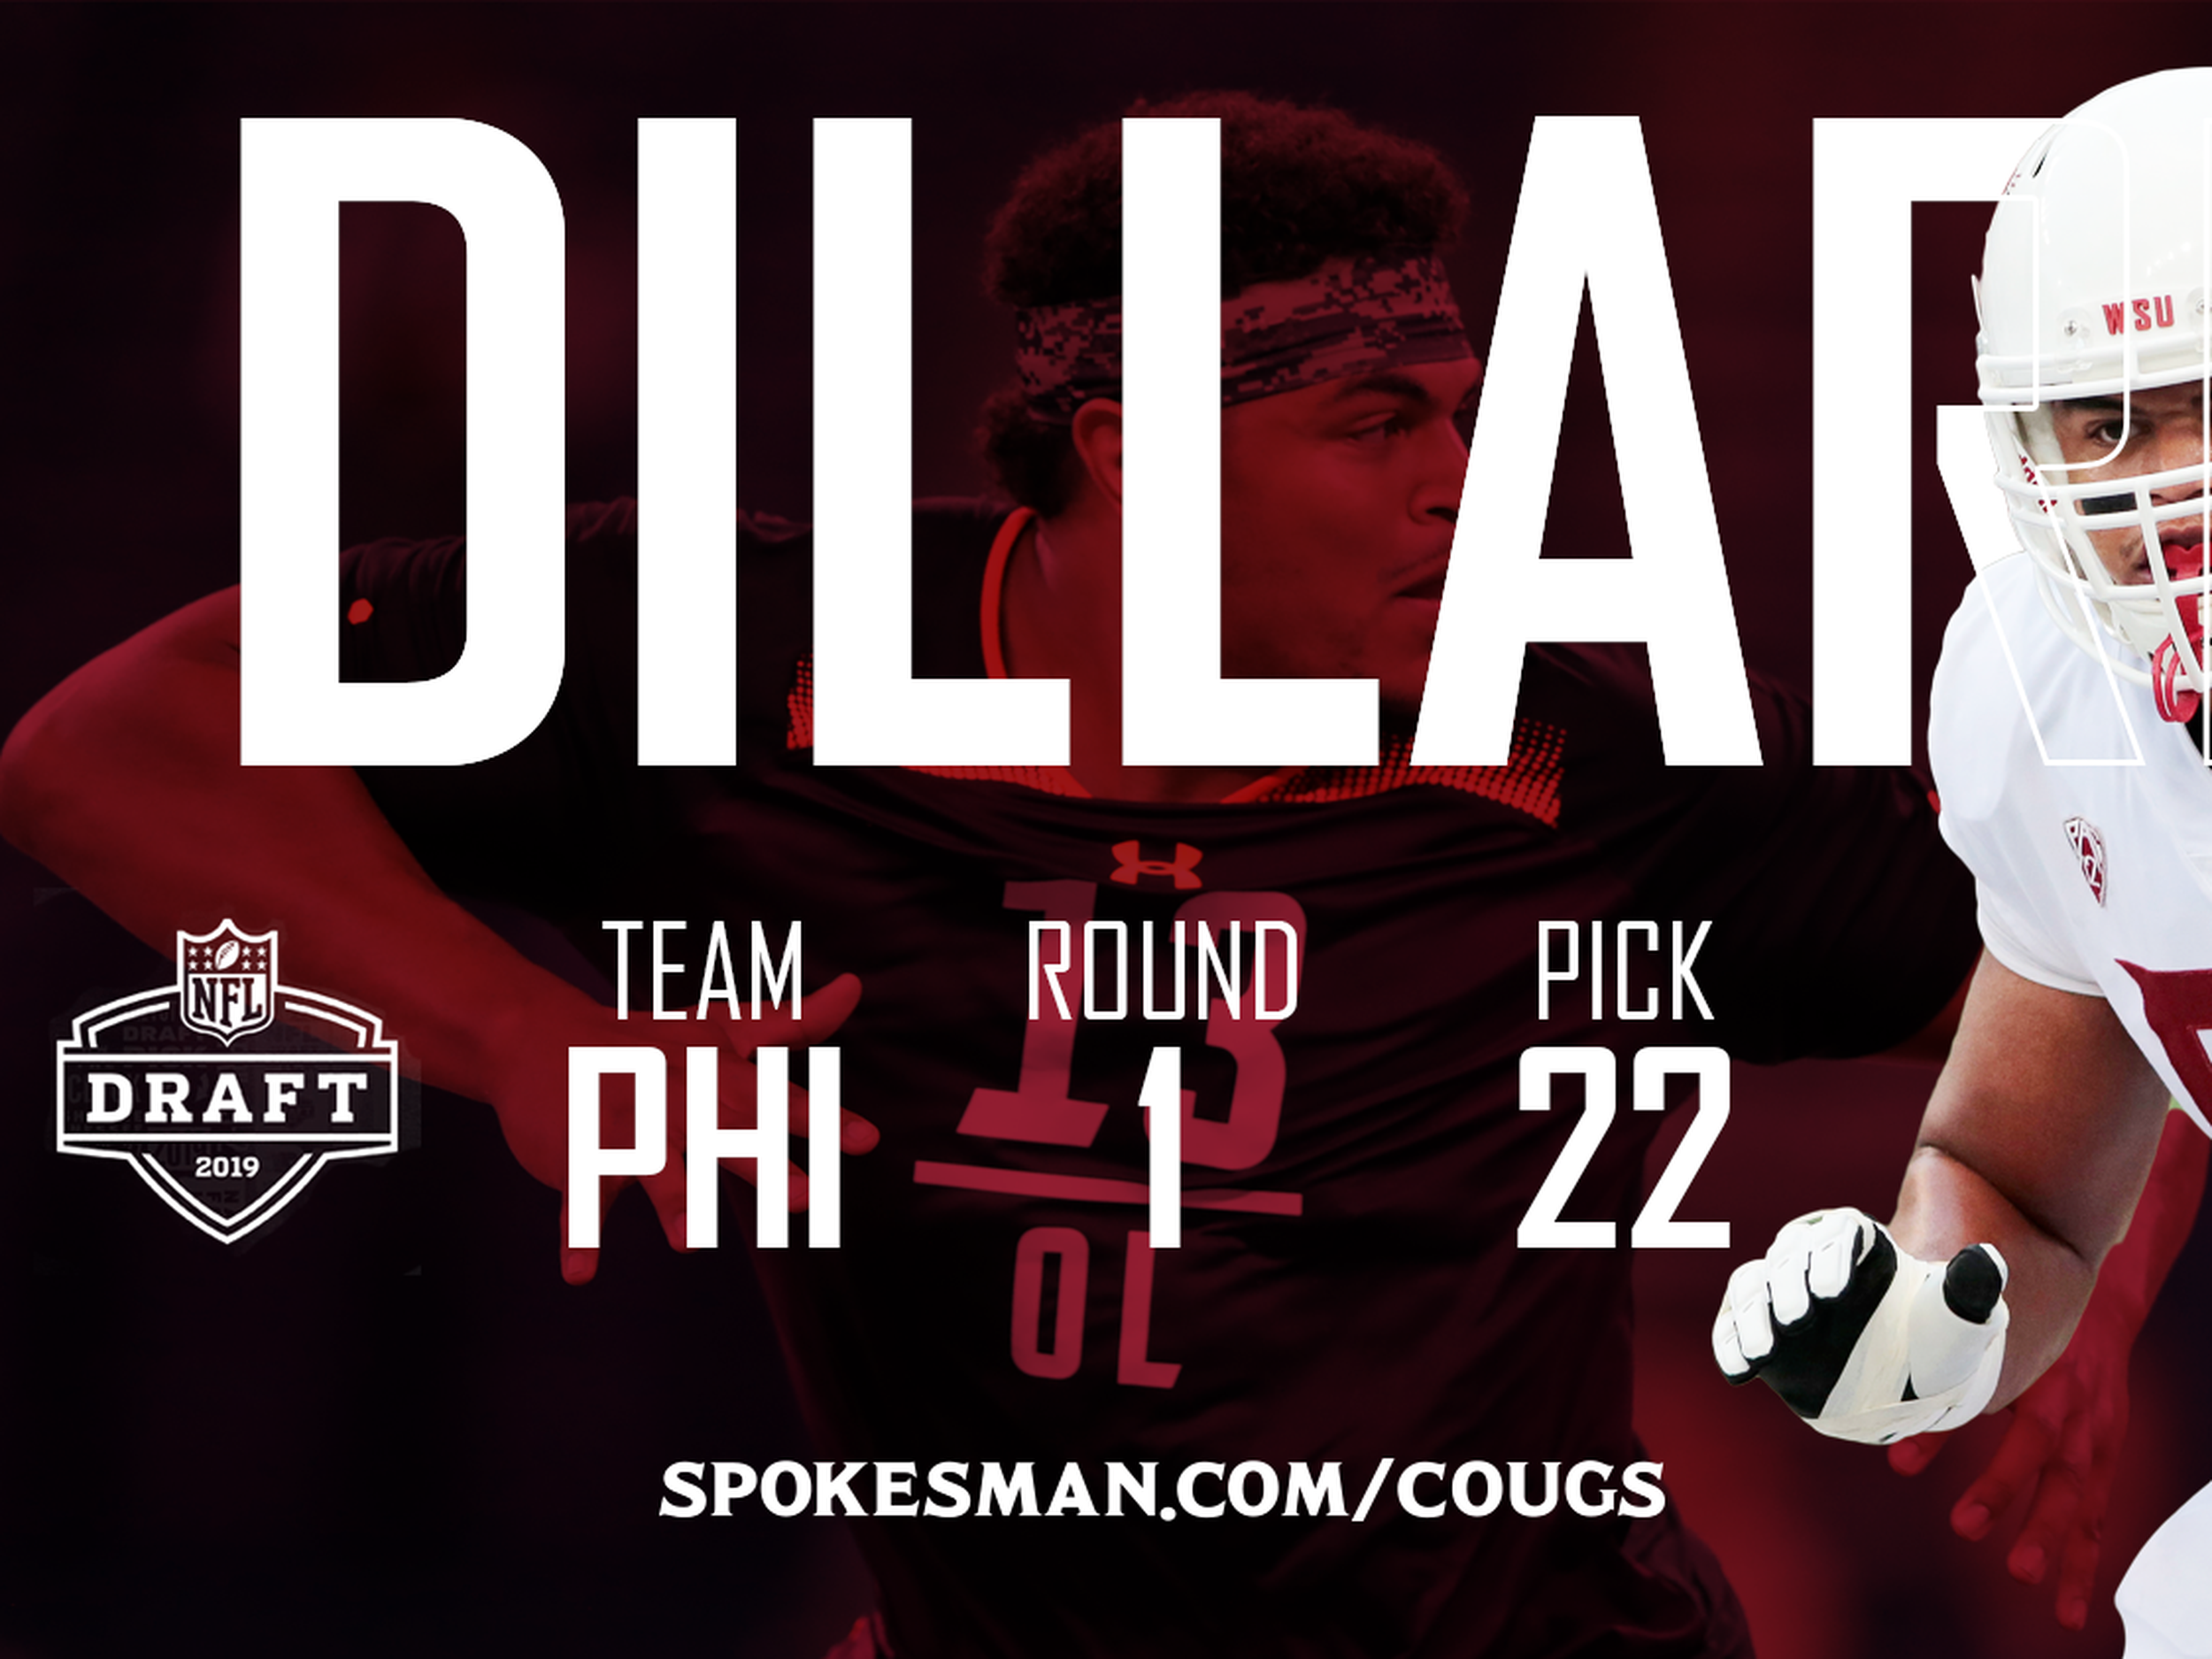 Andre Dillard Philadelphia Eagles Draft First Round Pick Game Jersey - Green